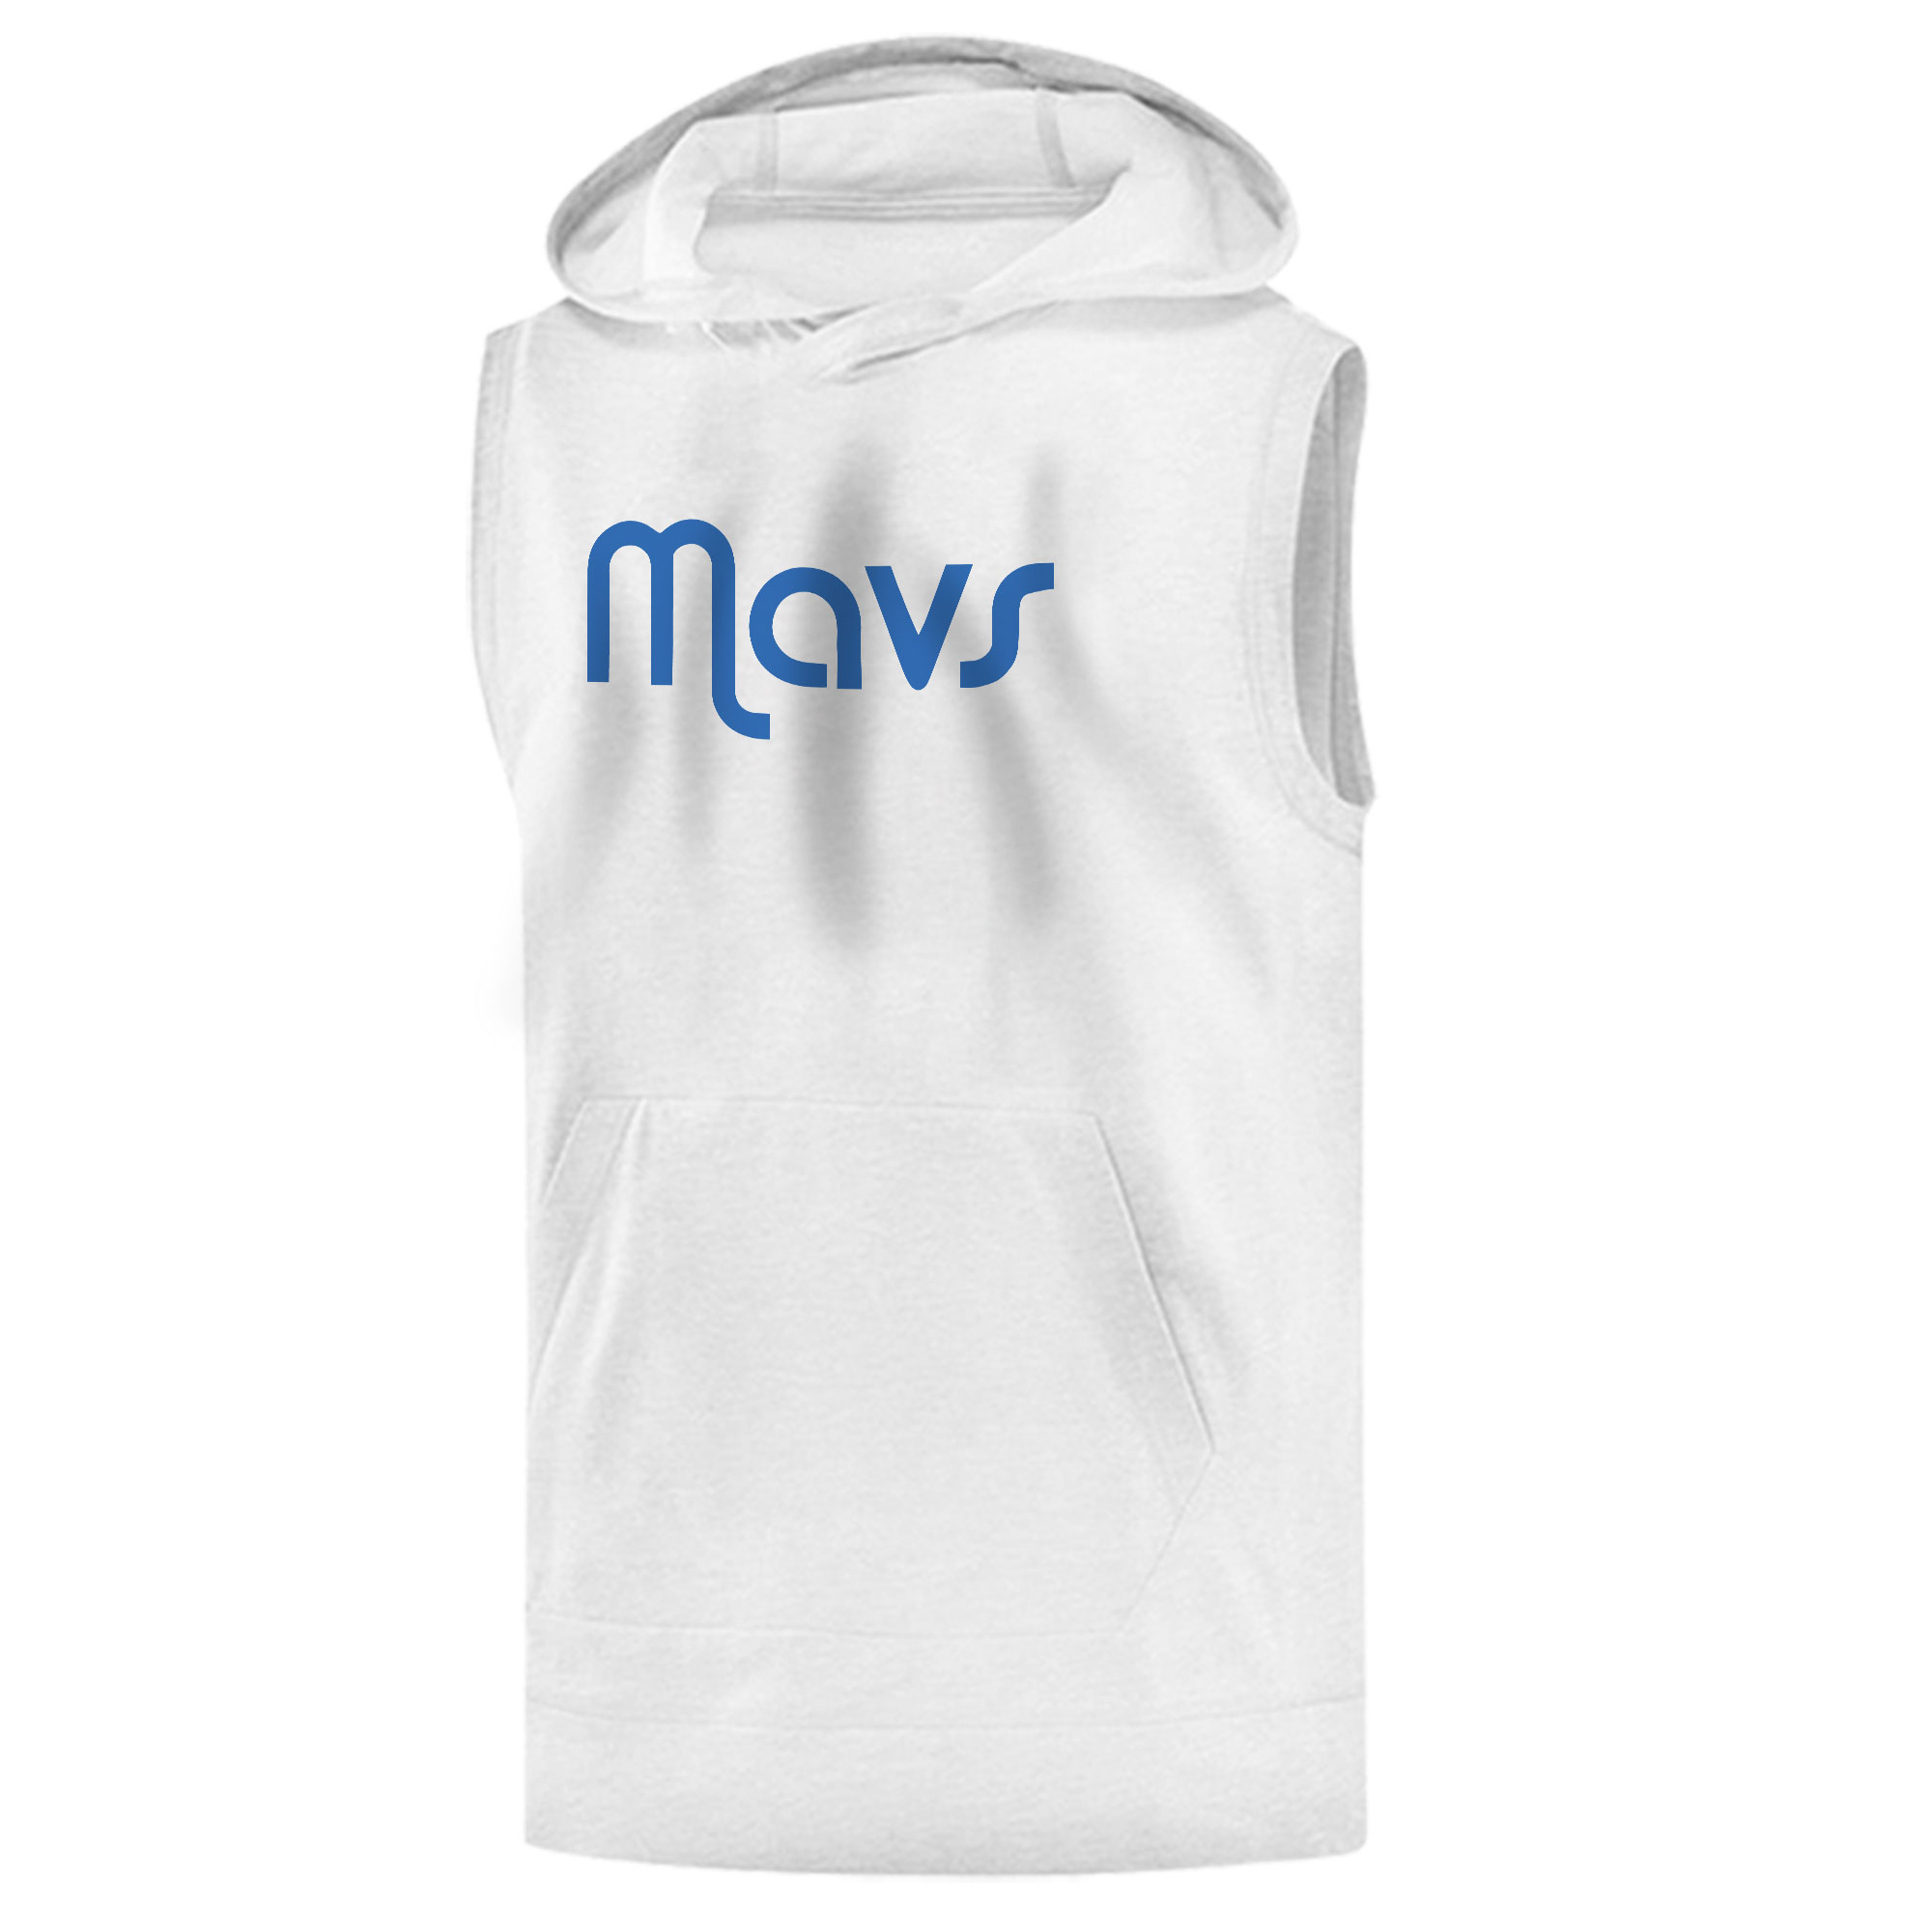 Dallas Mavericks Sleeveless (KLS-WHT-440-dallas-mavs)